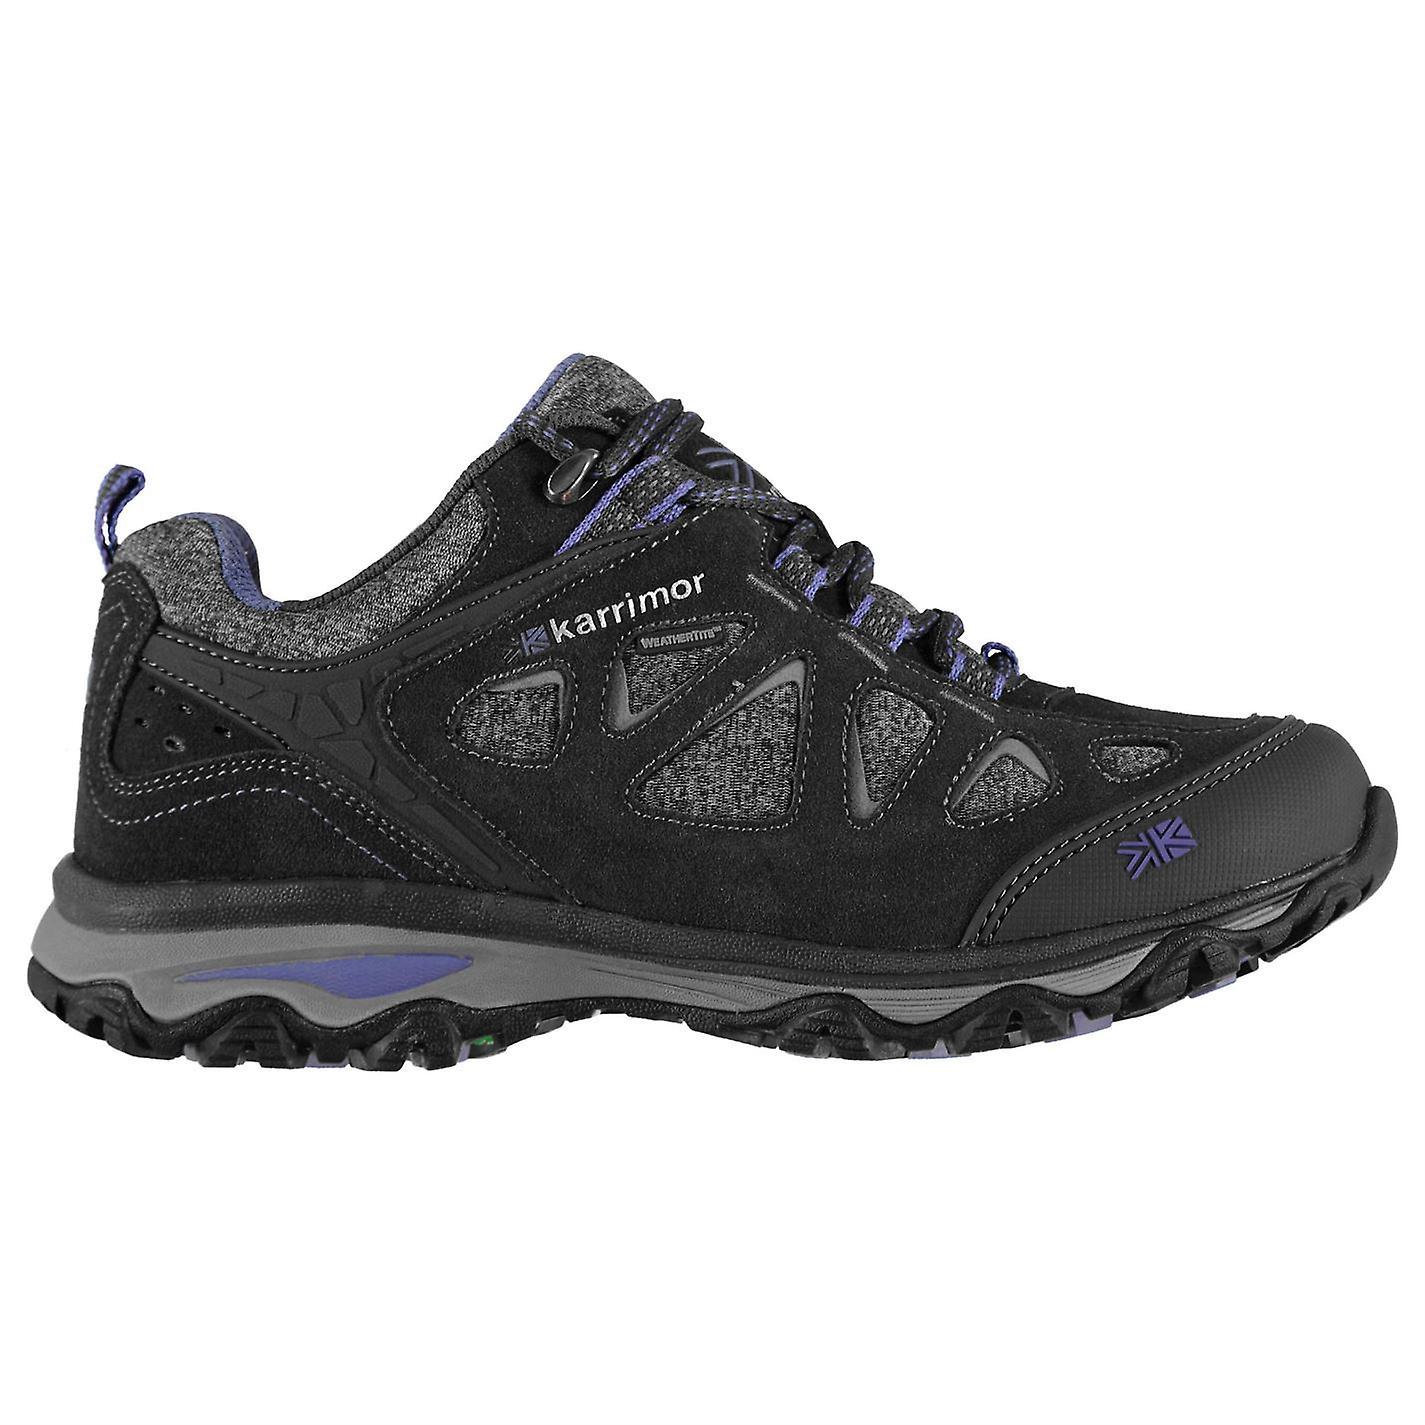 Karrimor femmes Cuba II Walking Hiking chaussures bottes Ladies